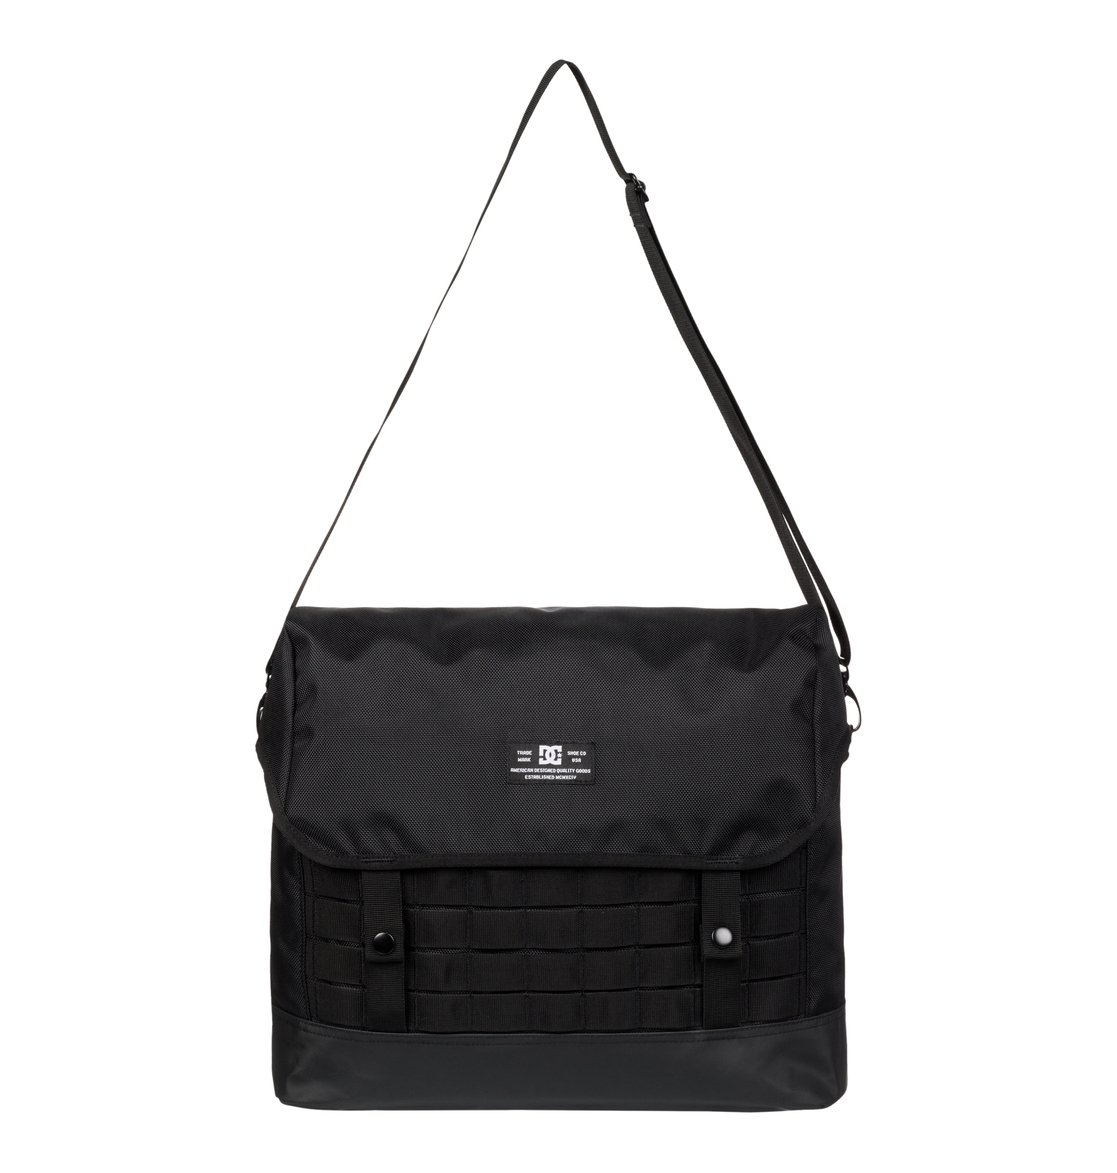 Harbor - Drawstring Bag от DC Shoes